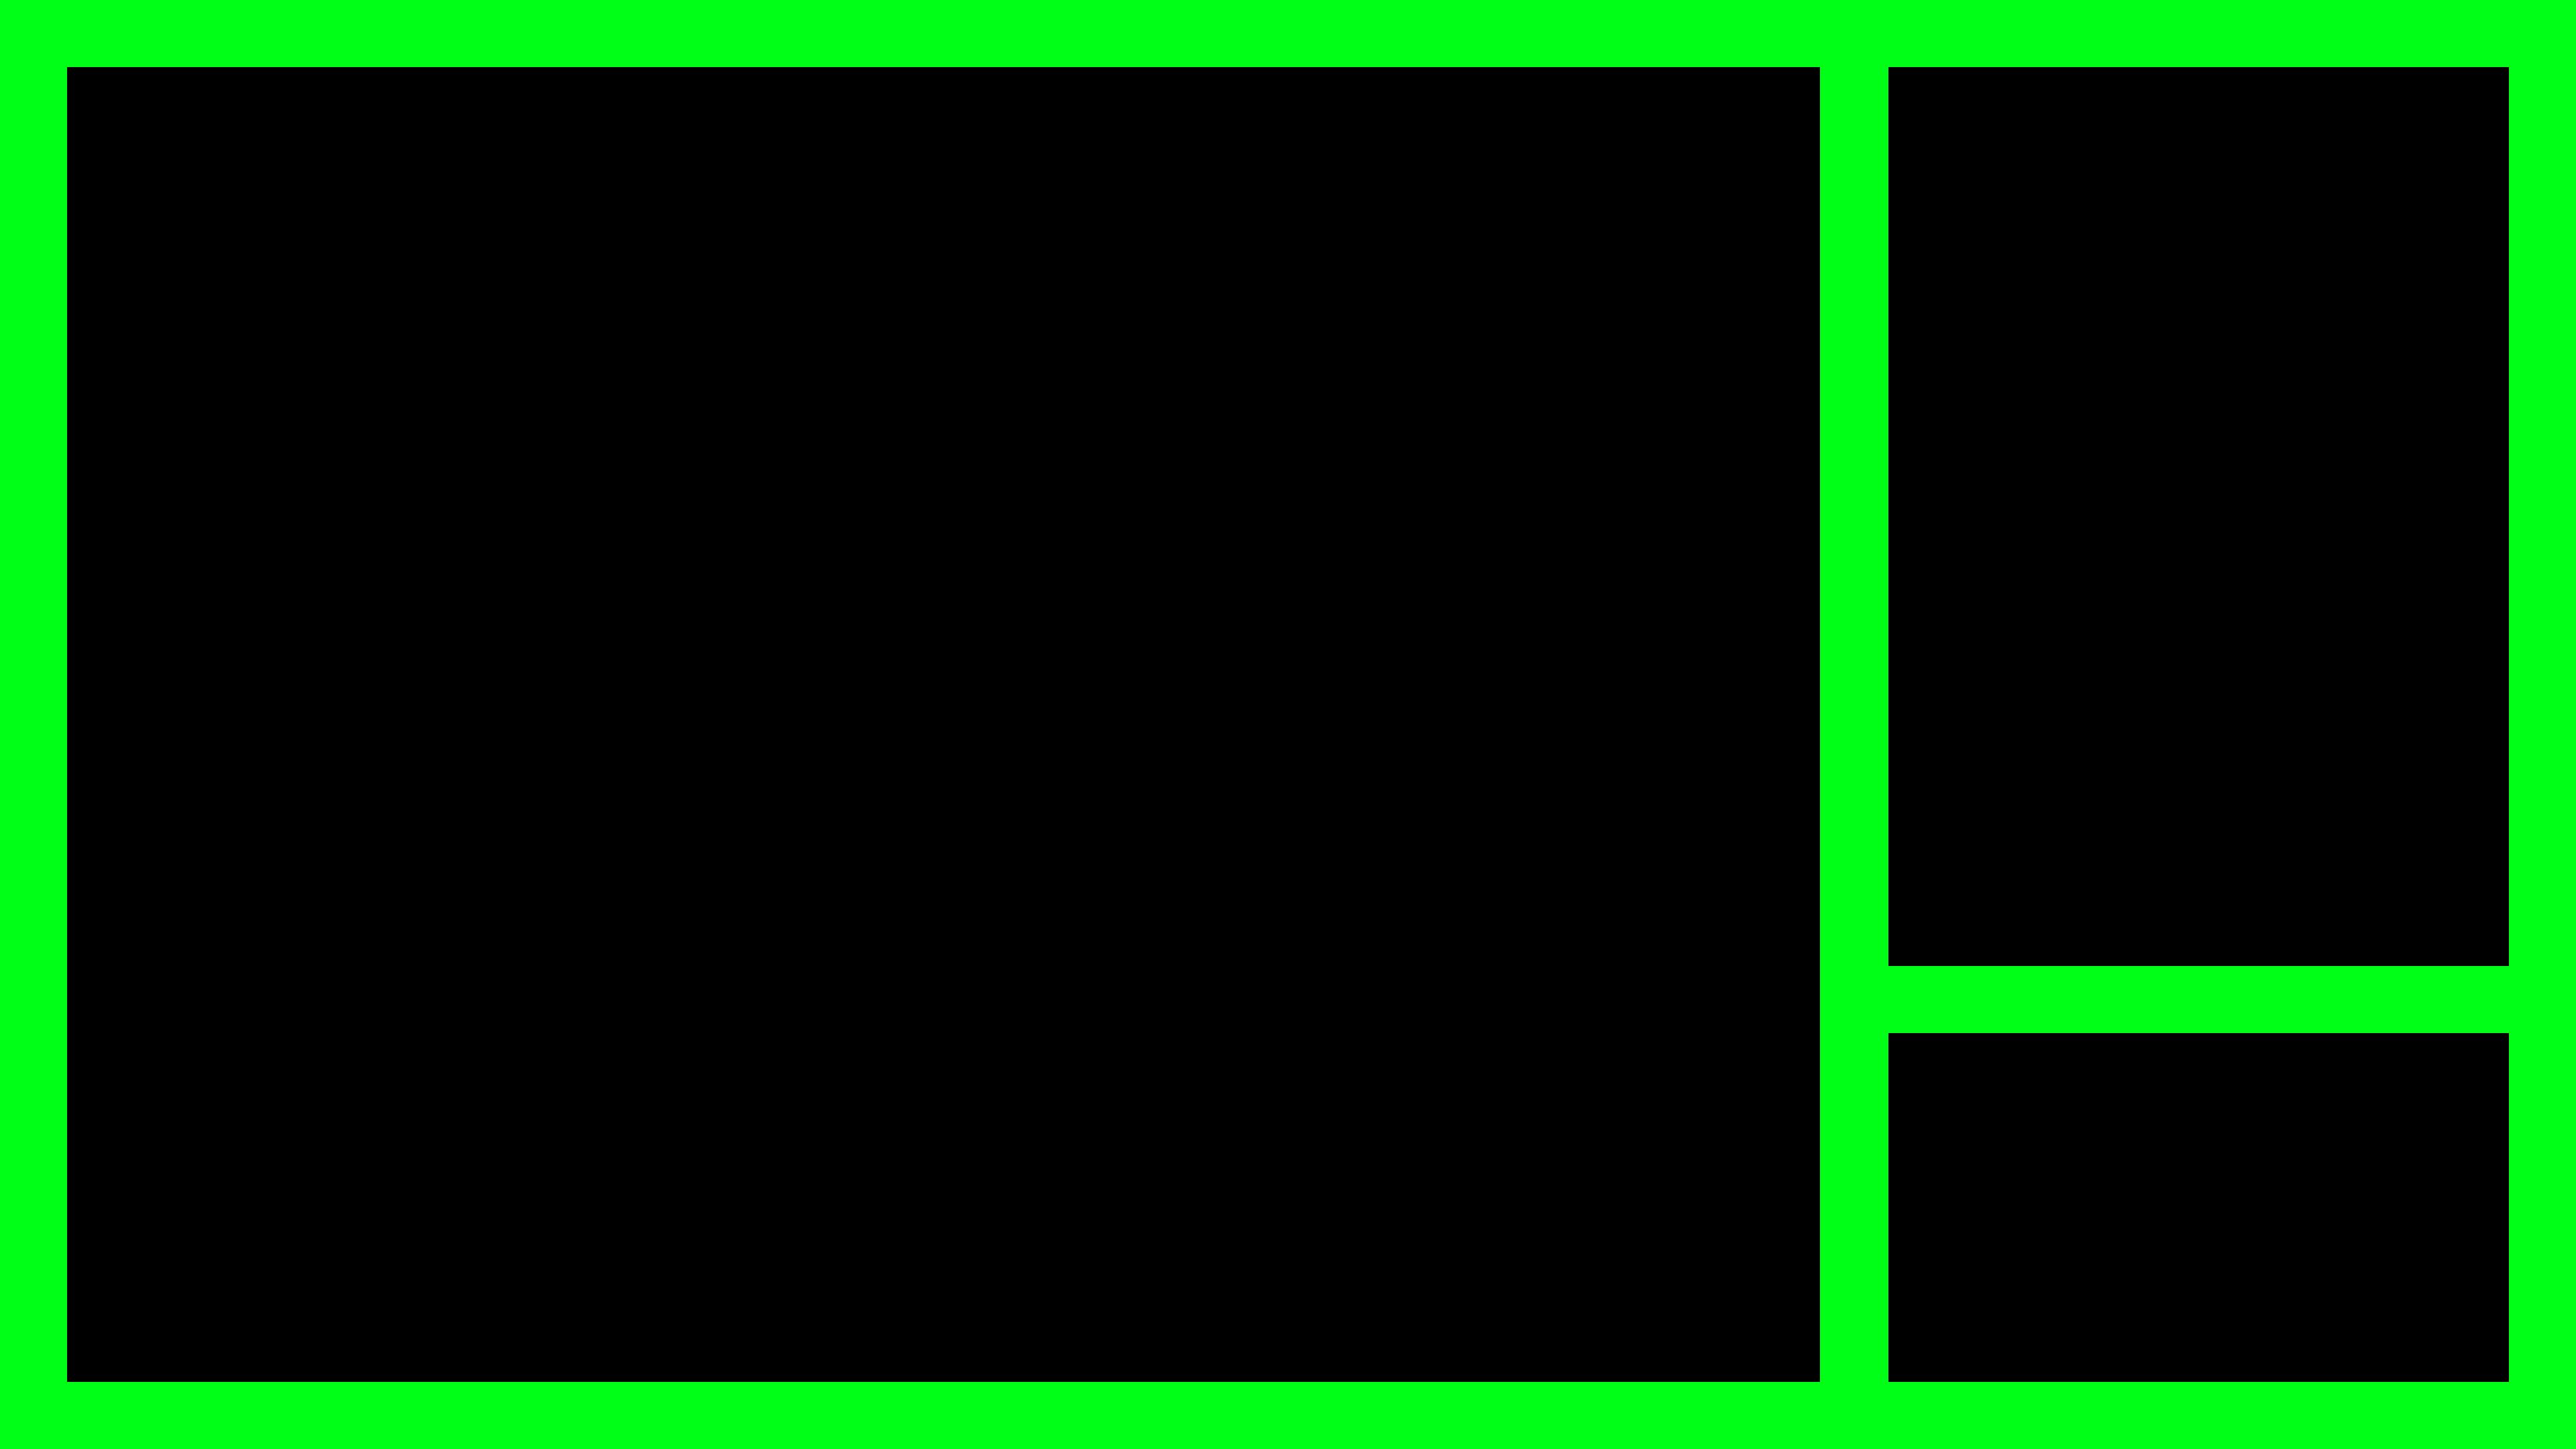 [Image: 4x3-Custom-Overlay.png]